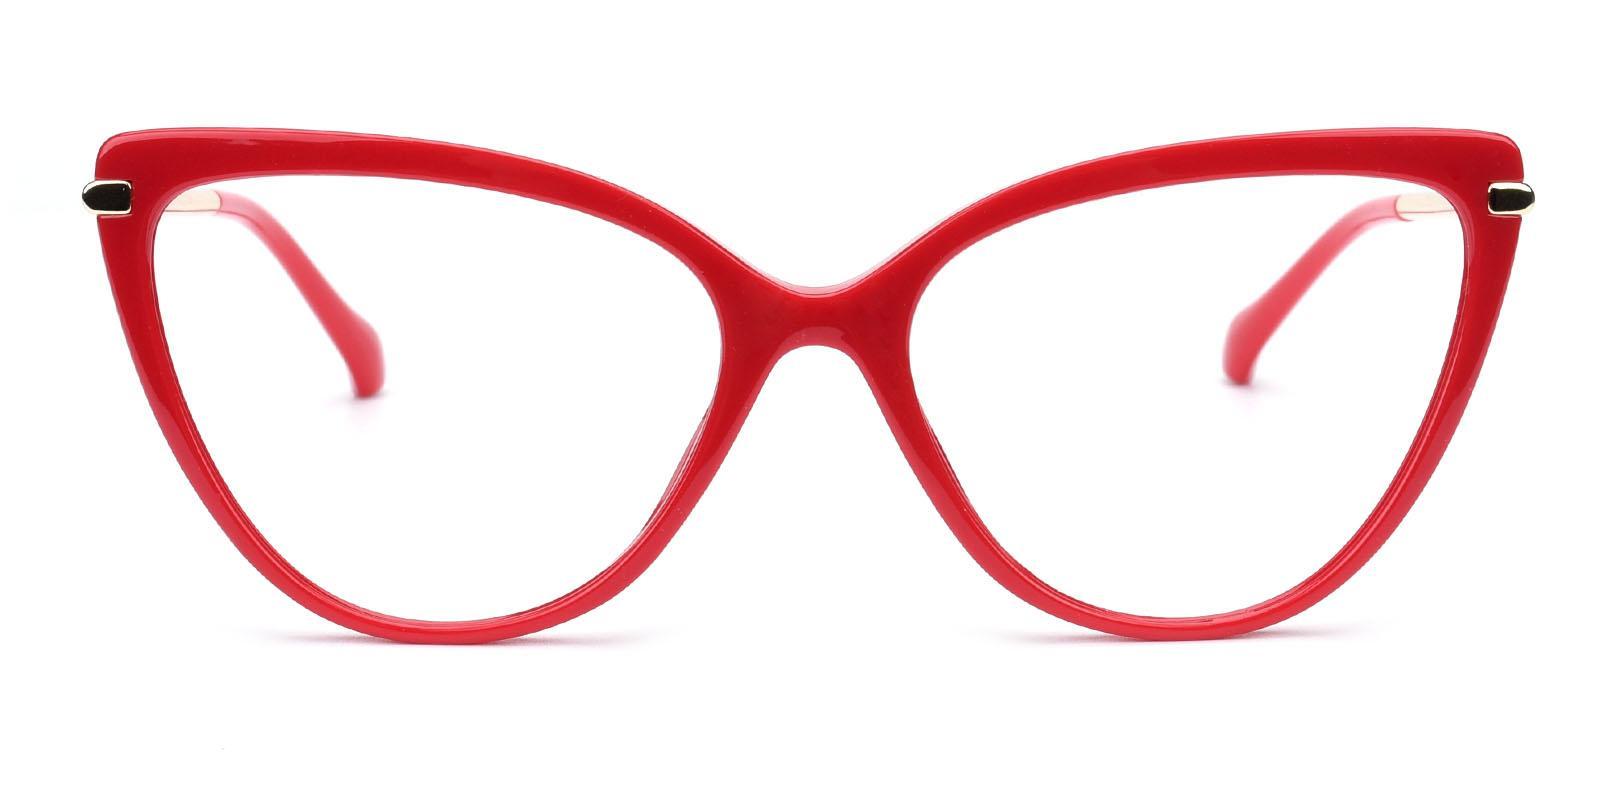 Doris-Red-Cat-Combination-Eyeglasses-additional2